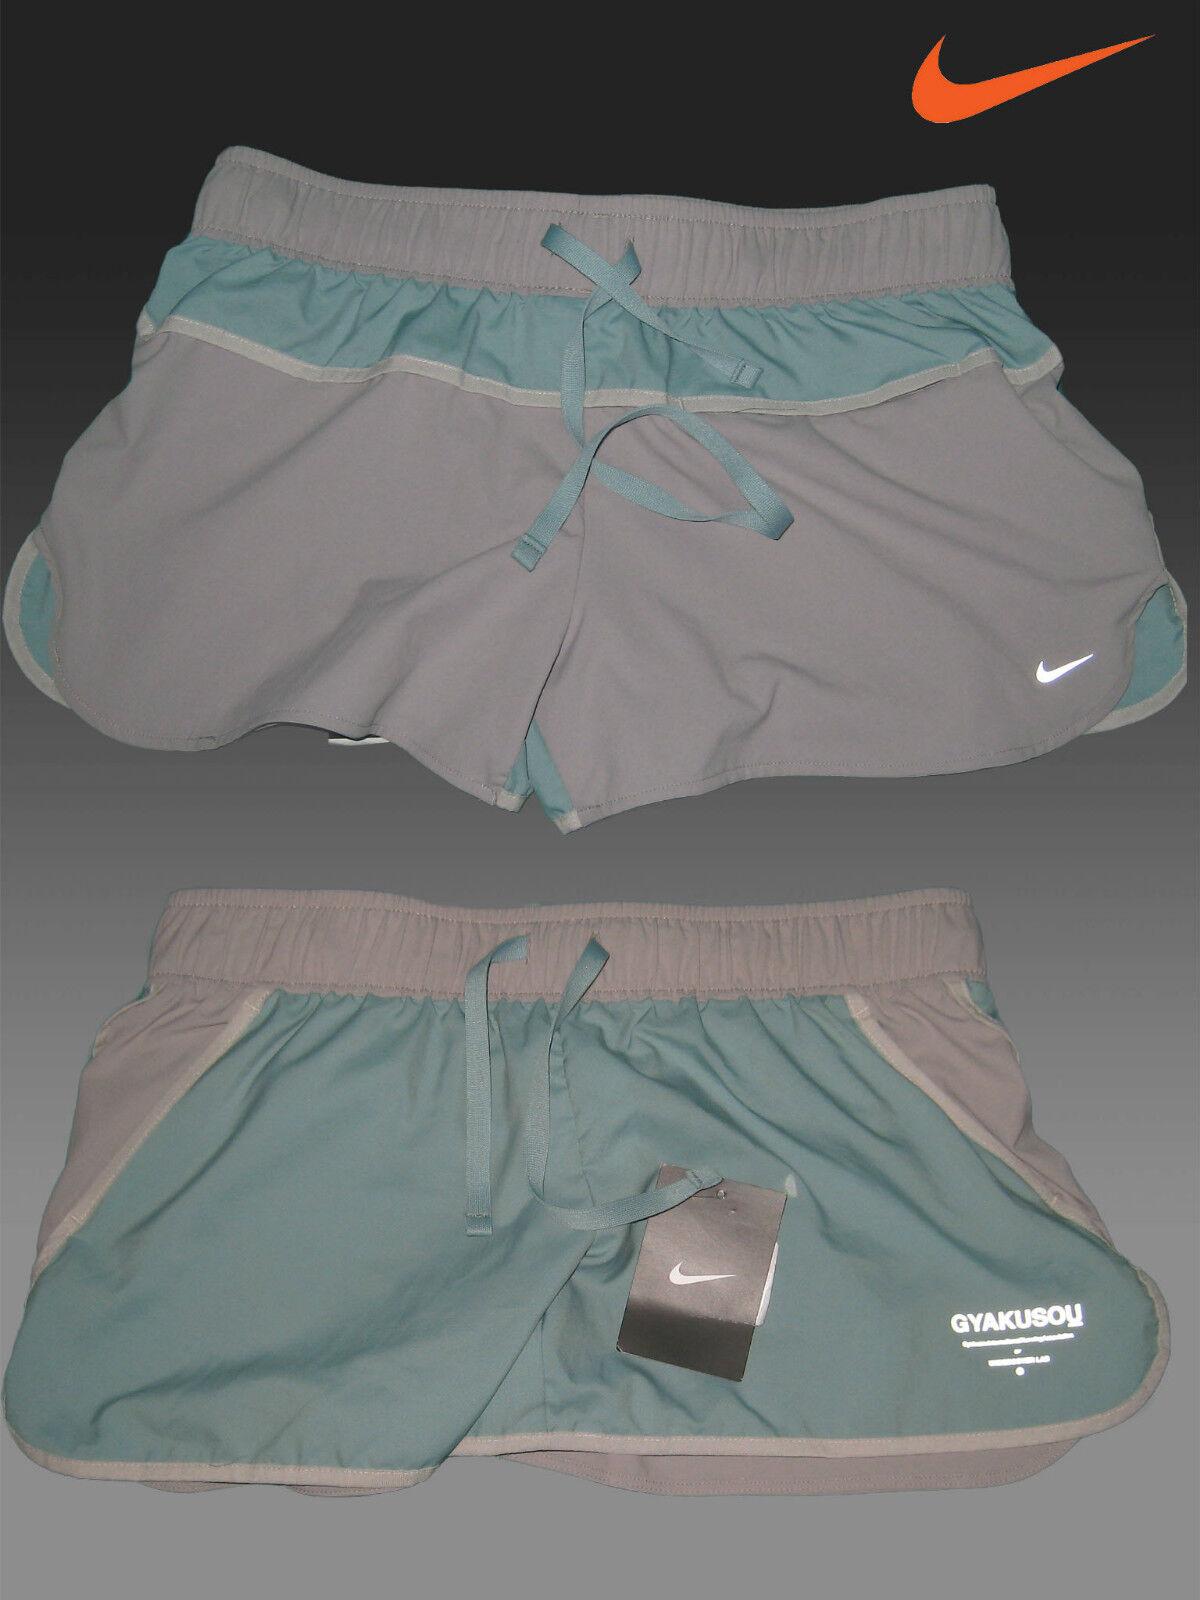 Nike Gyakusou Undercover Damen Laufshorts Laufshorts Laufshorts - Cannon Juni Takahashi M 0e936e